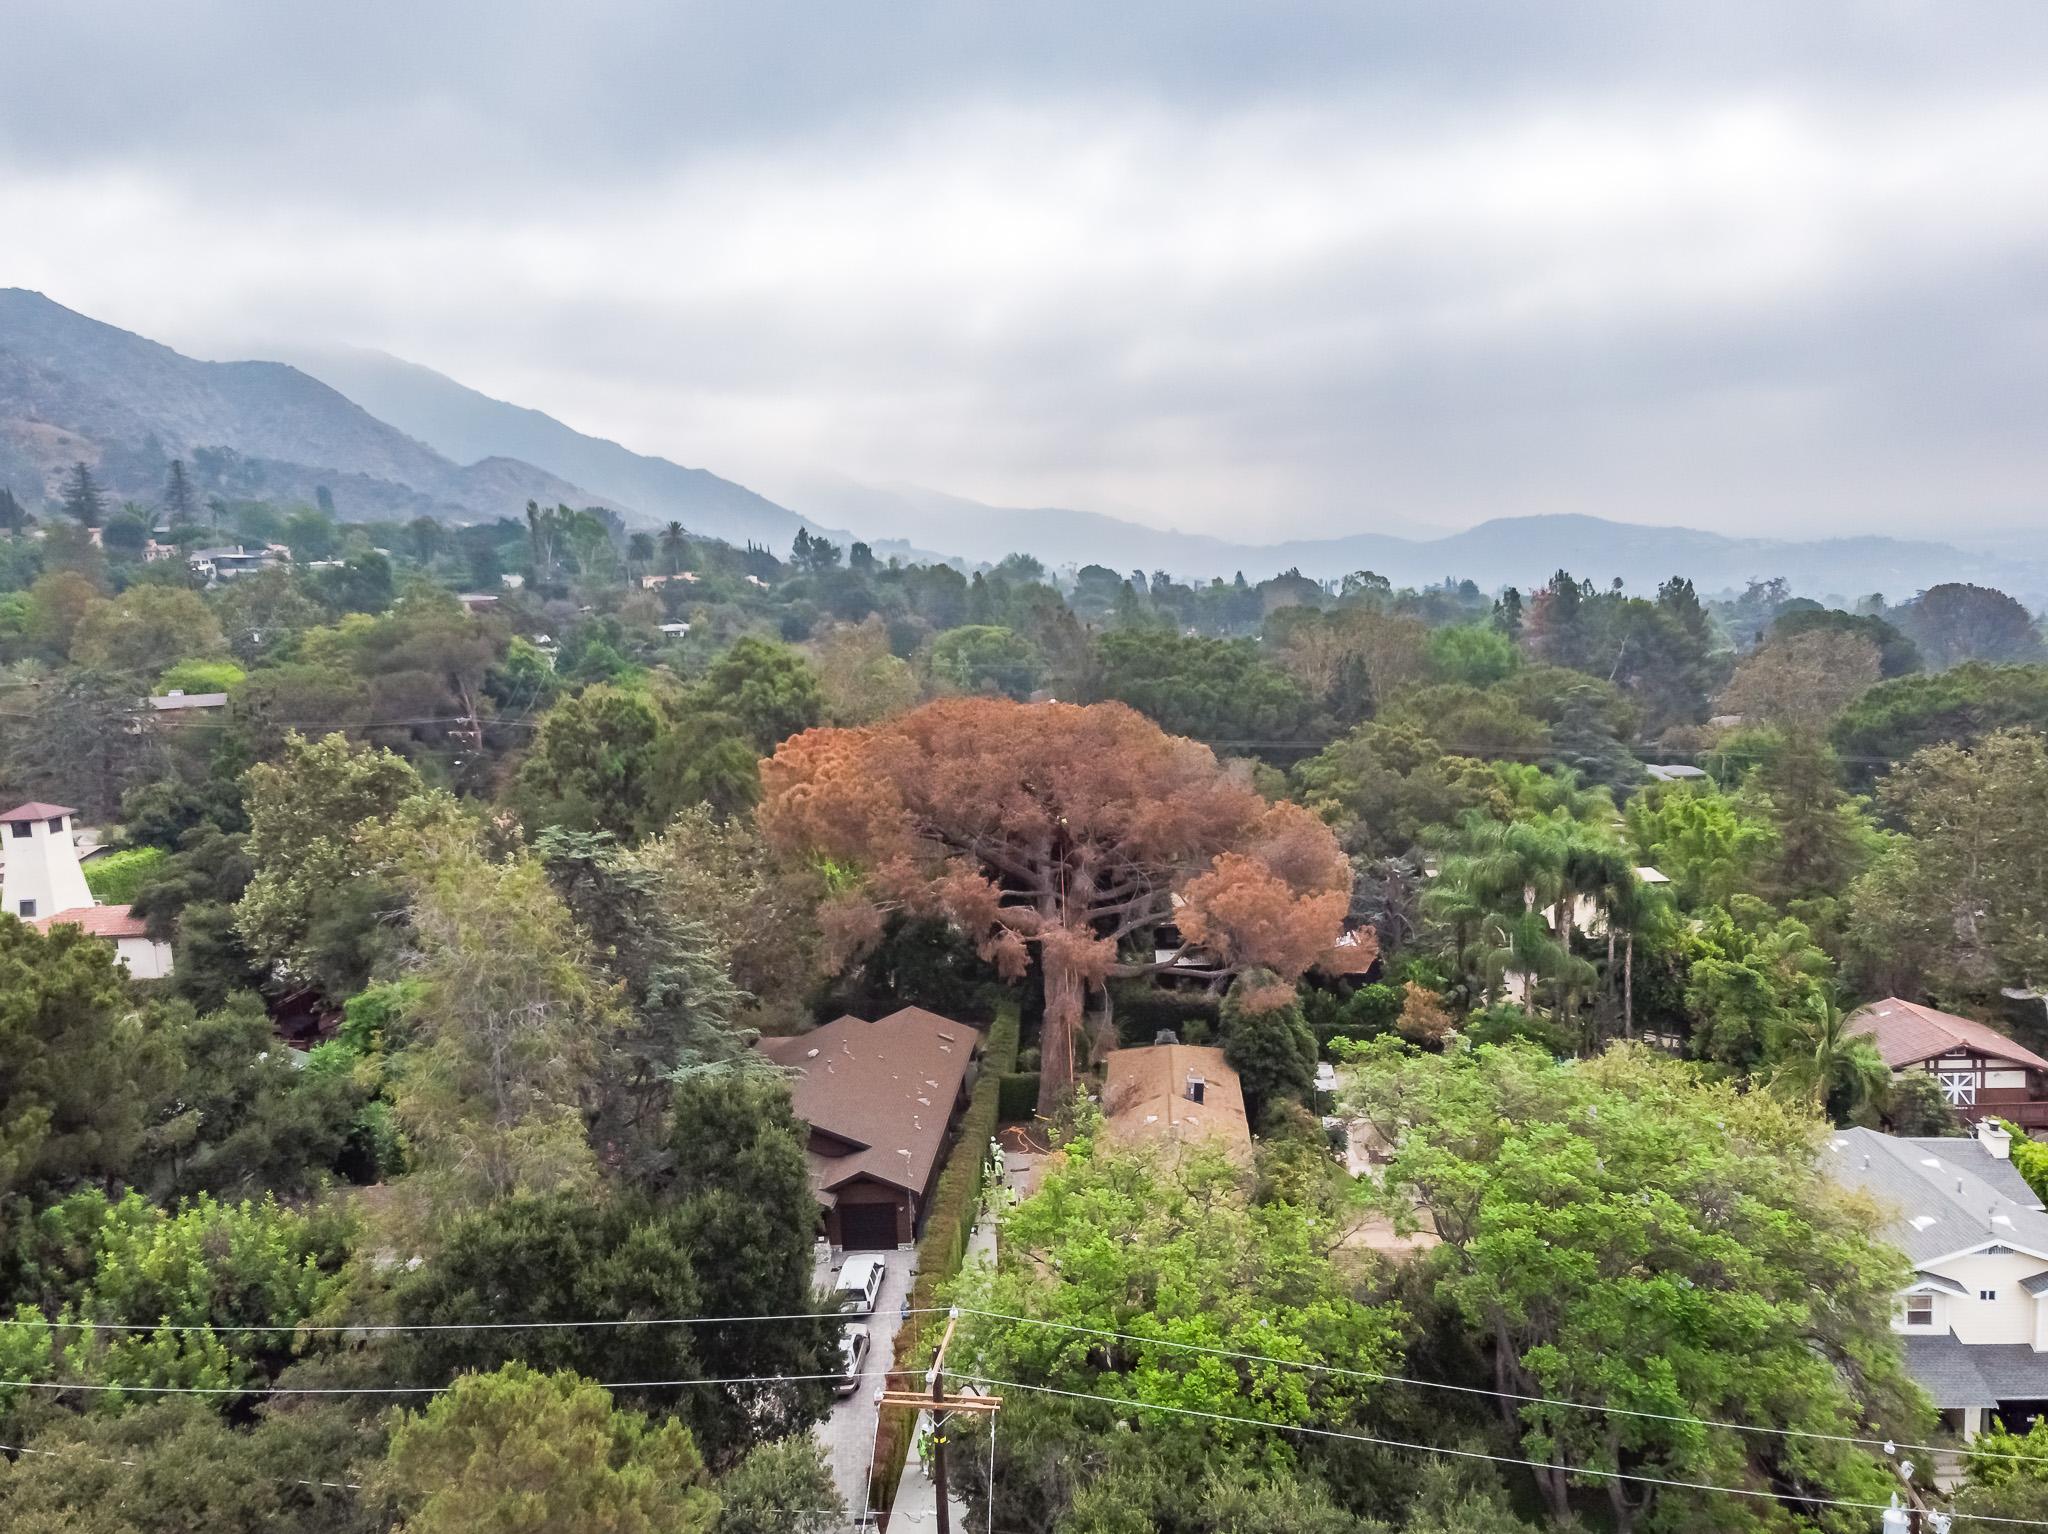 Mariposa Tree Removal Aerial 1-3.jpg